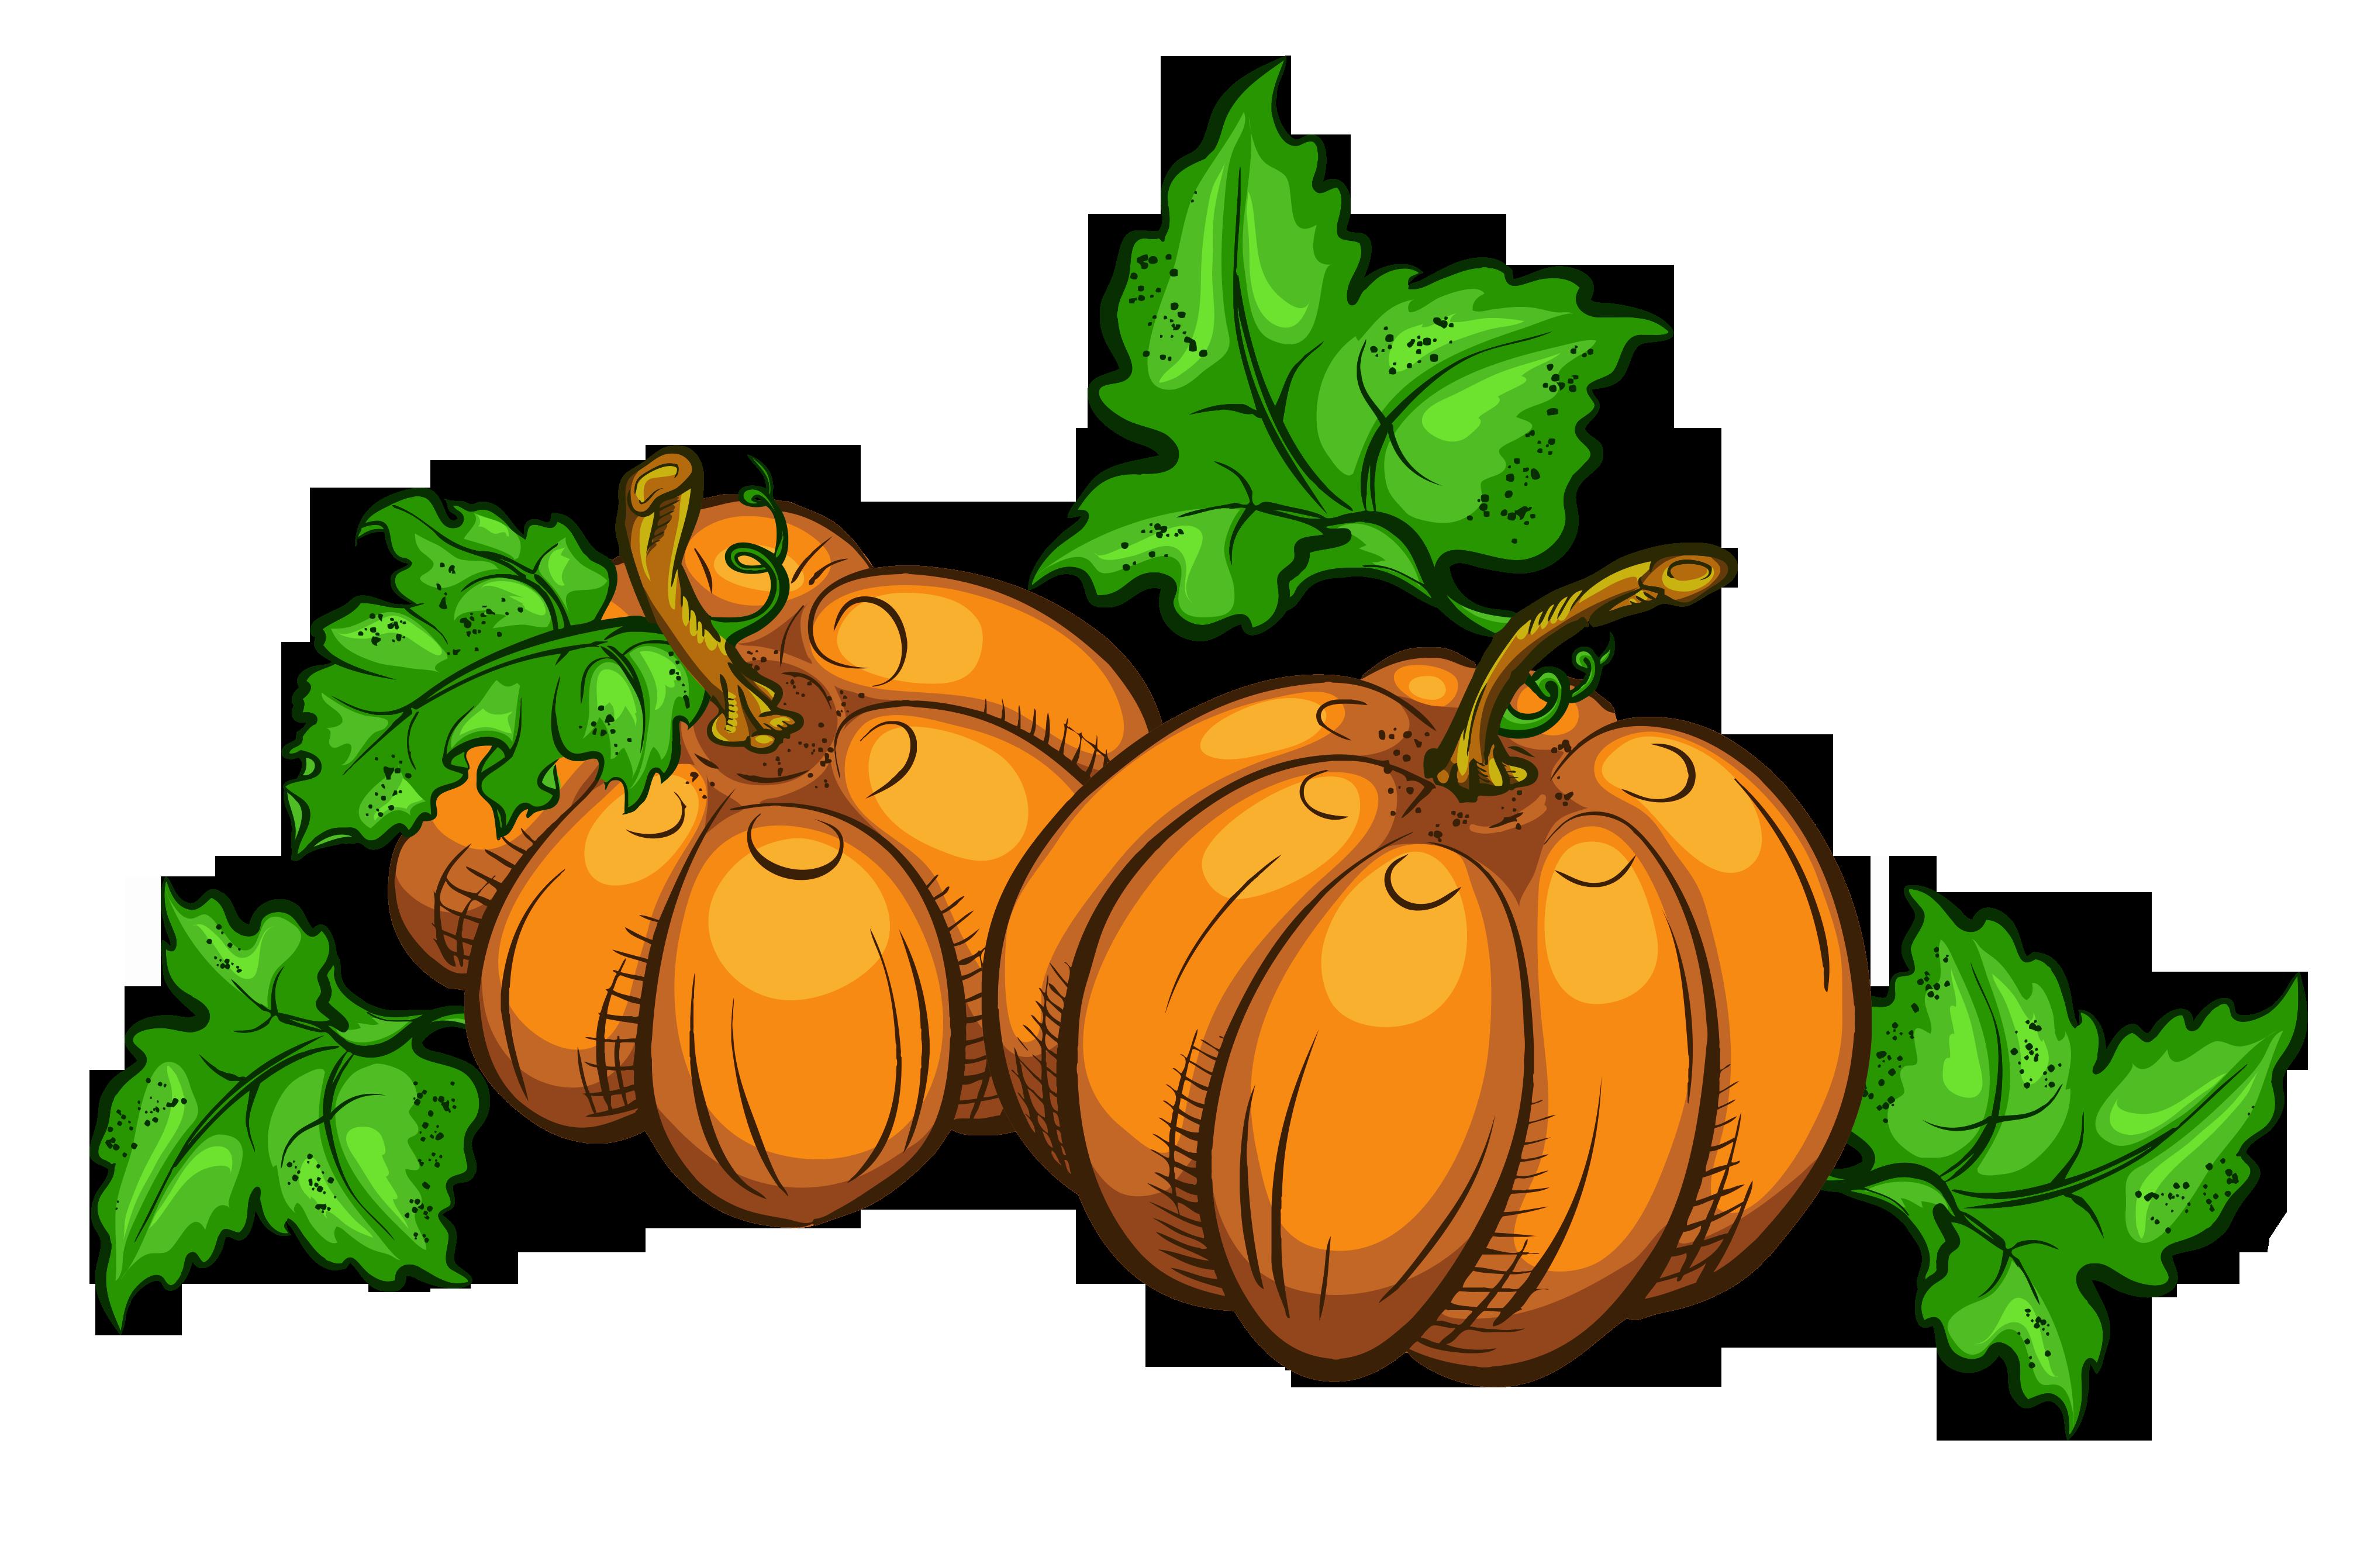 Transparent pumpkins png picture. Pumpkin clipart golf